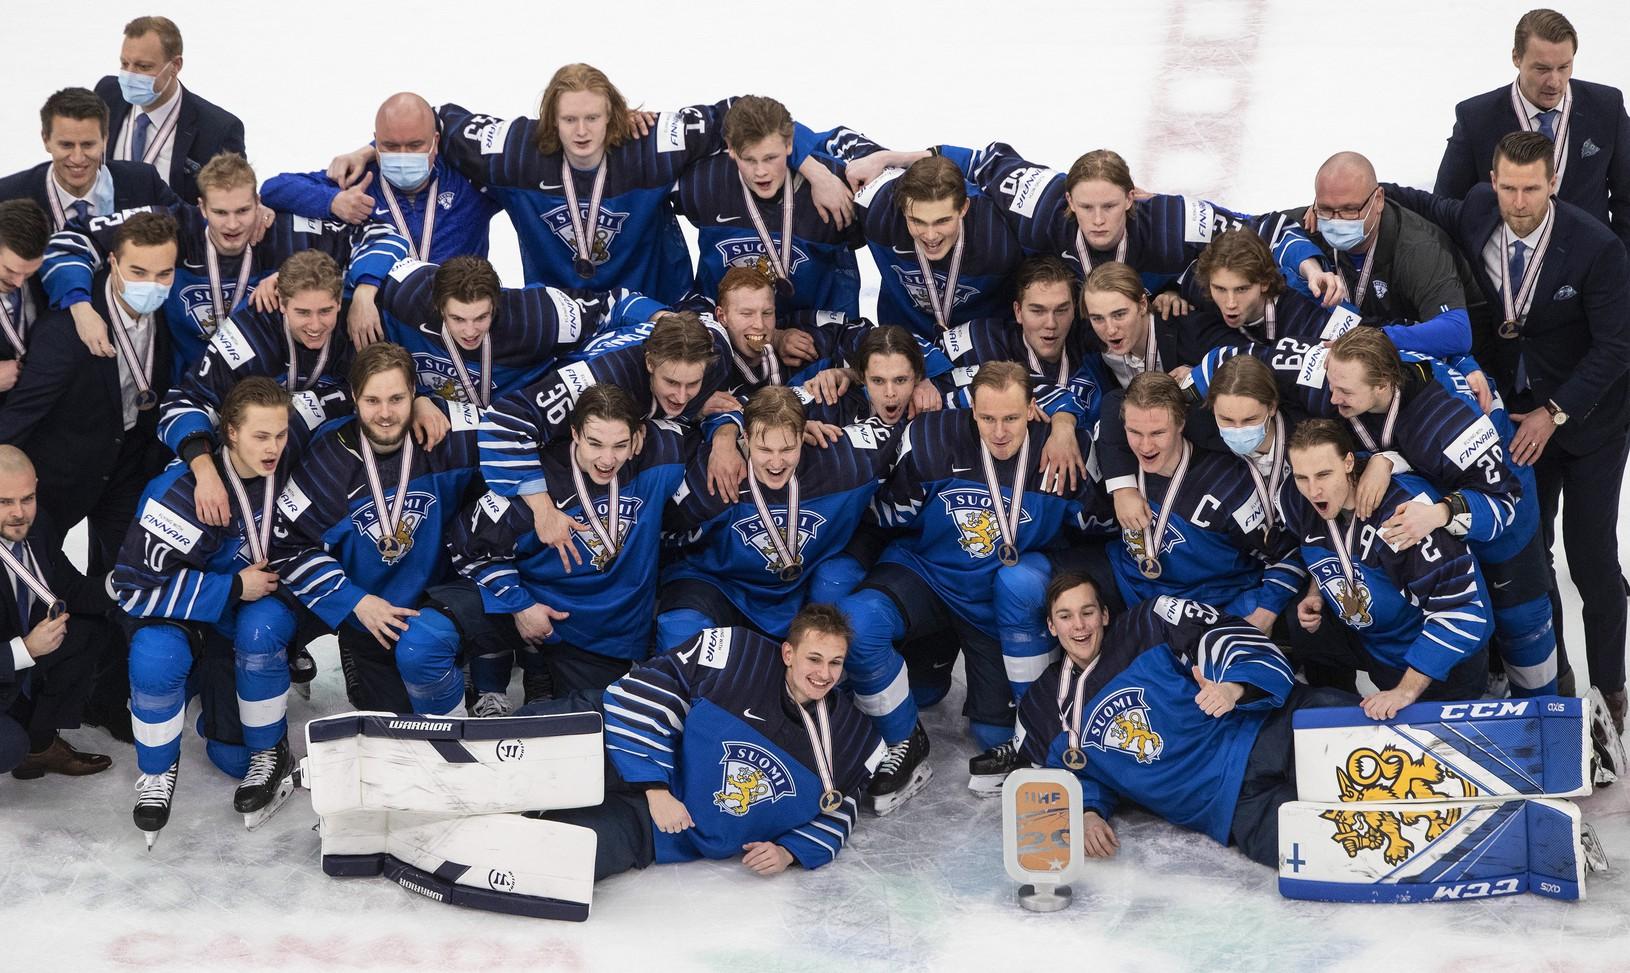 Fíni získali bronz